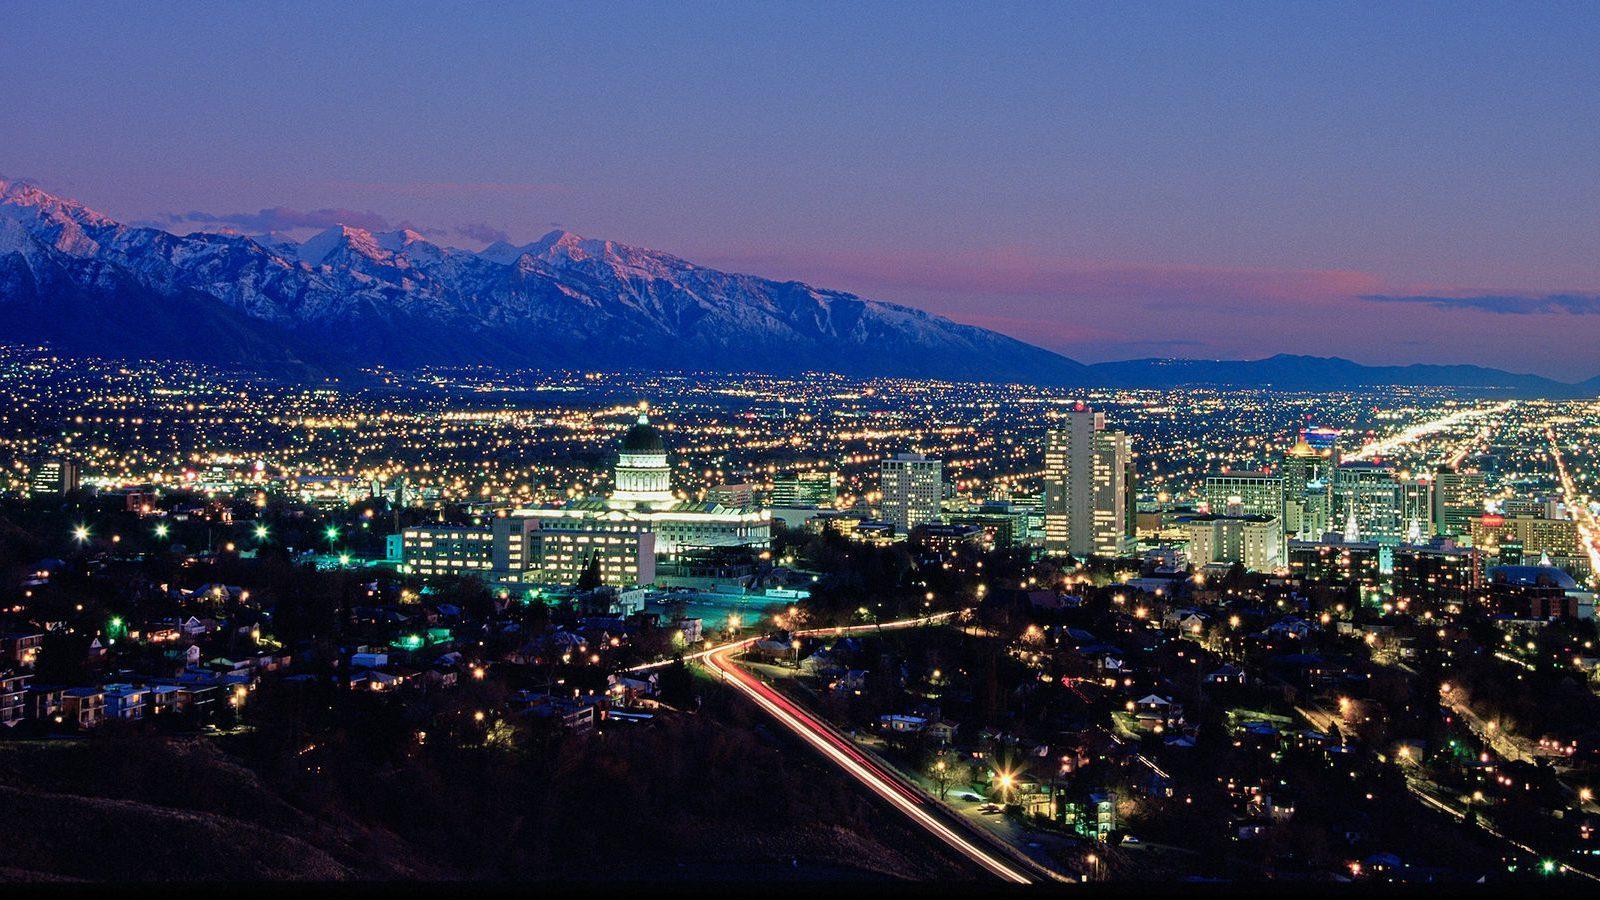 Over Salt Lake City